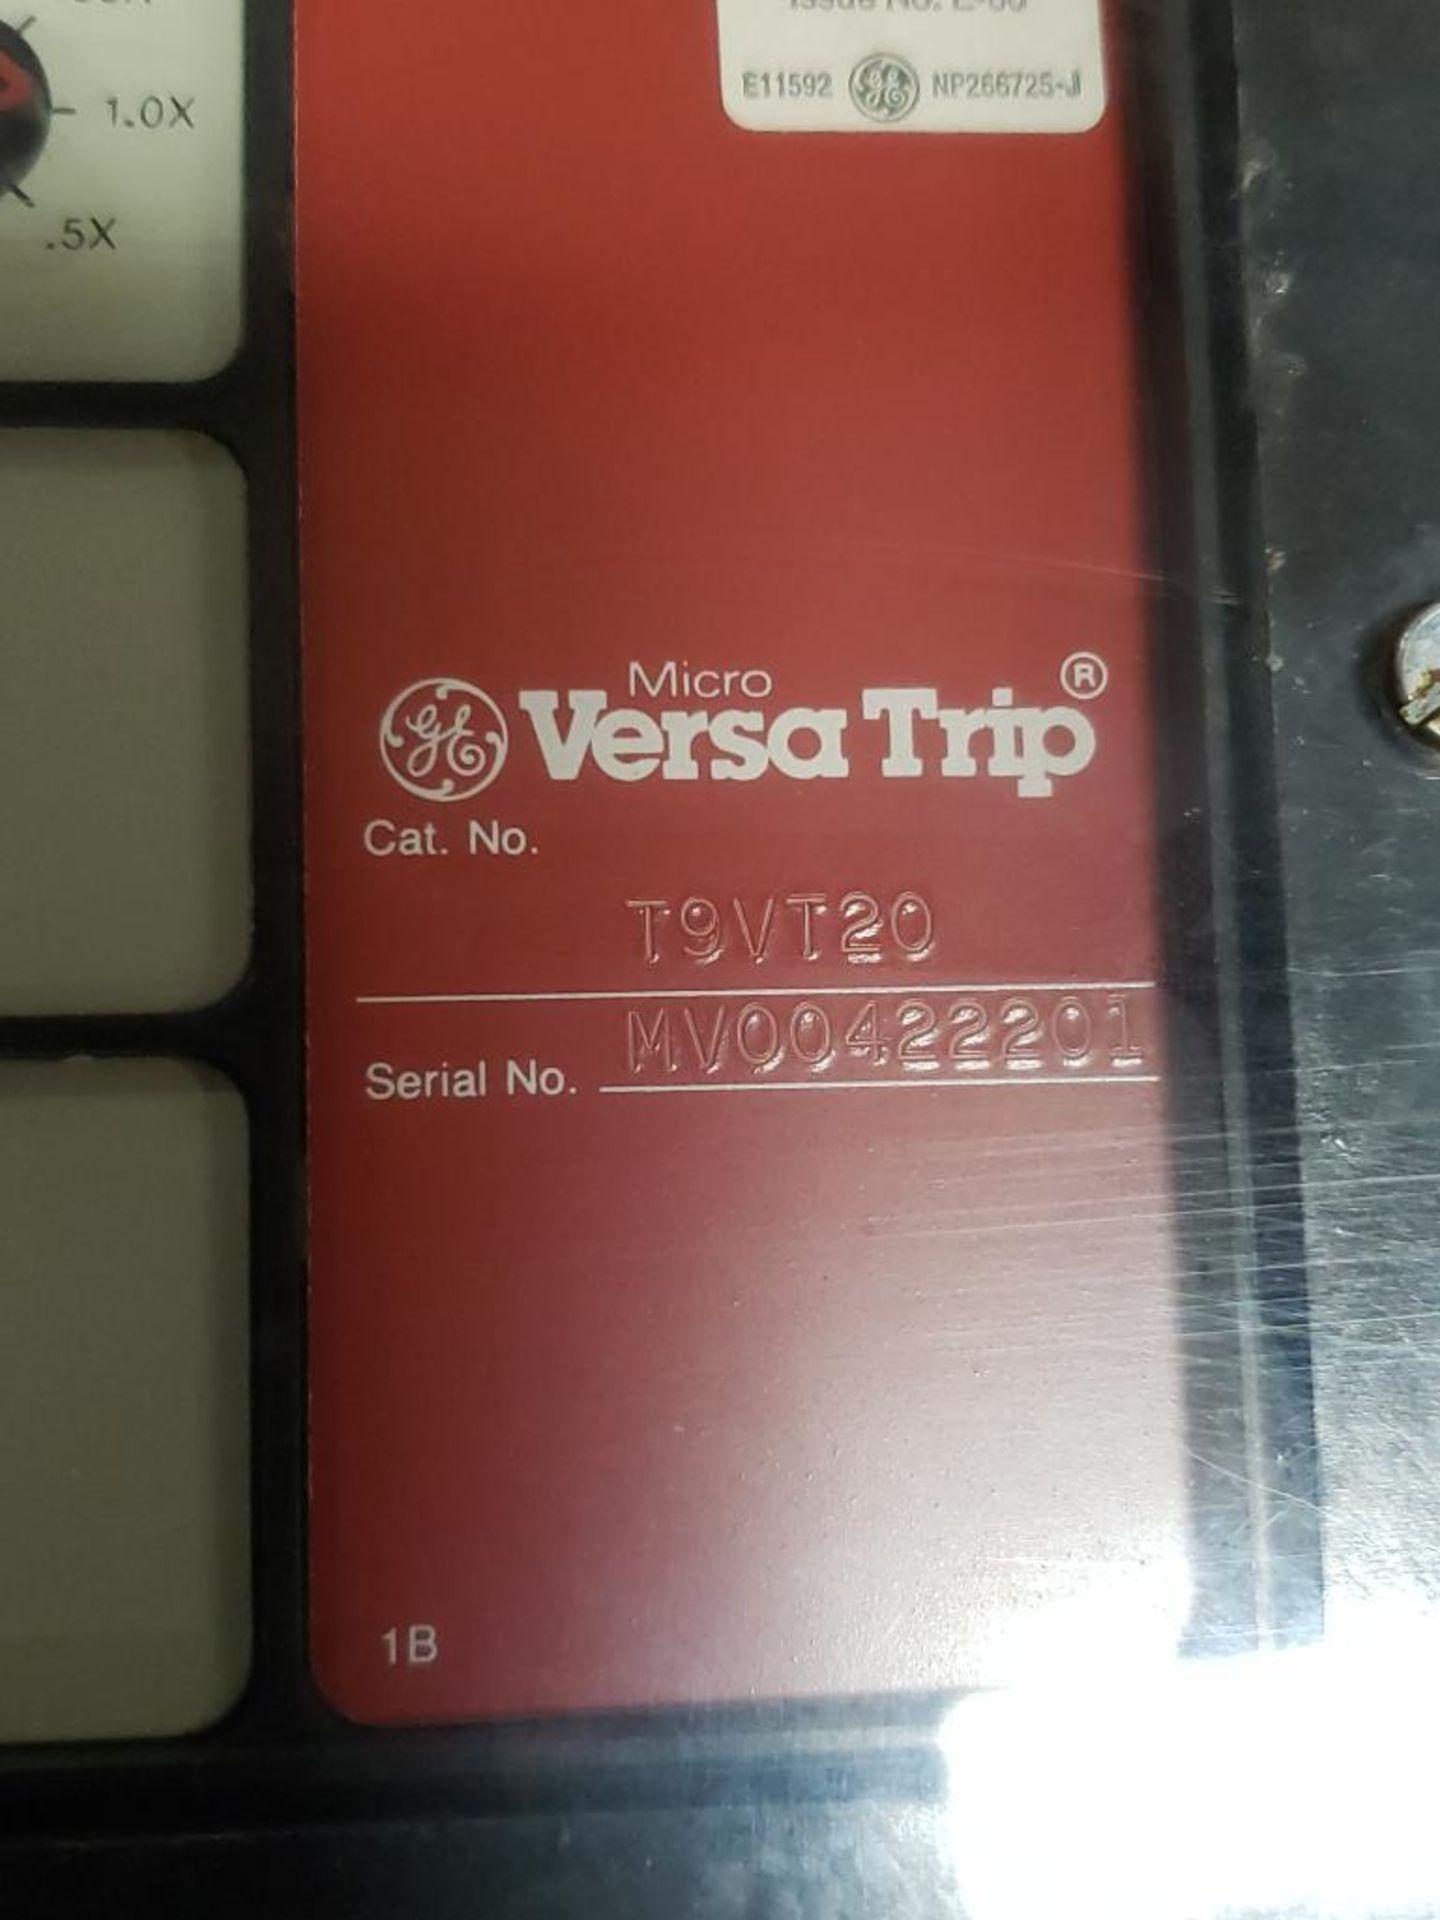 GE Micro Versa Trip T9VT20 Breaker. 1200Amp, 3-Pole. - Image 2 of 5